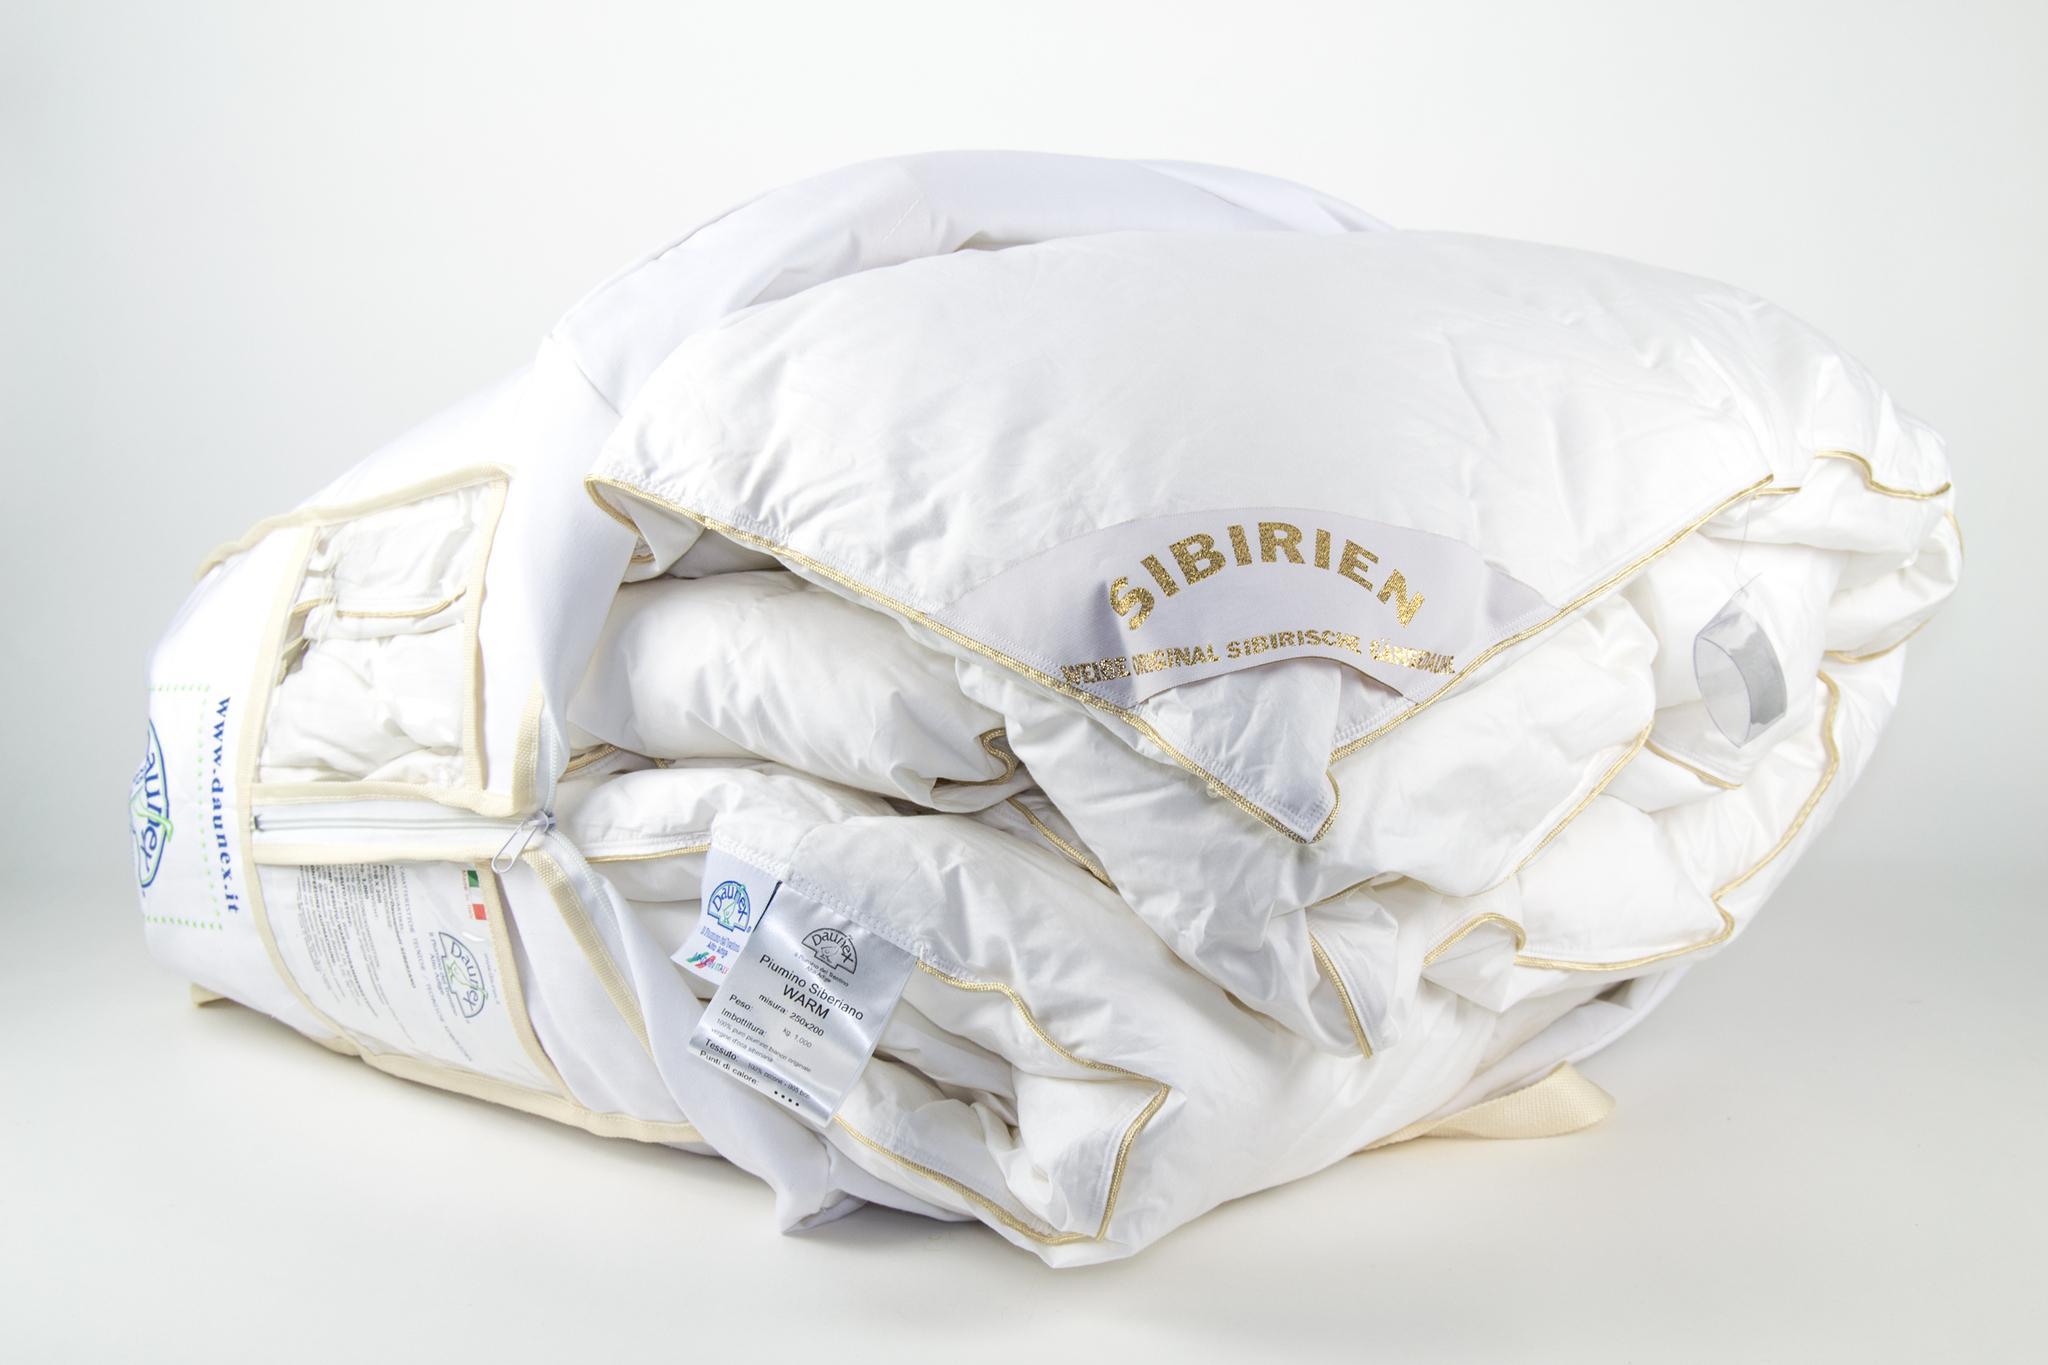 Одеяла Элитное одеяло пуховое 200х220 Siberiano от Daunex elitnoe-odeyalo-puhovoe-200h220-siberiano-ot-daunex-italiya.jpg